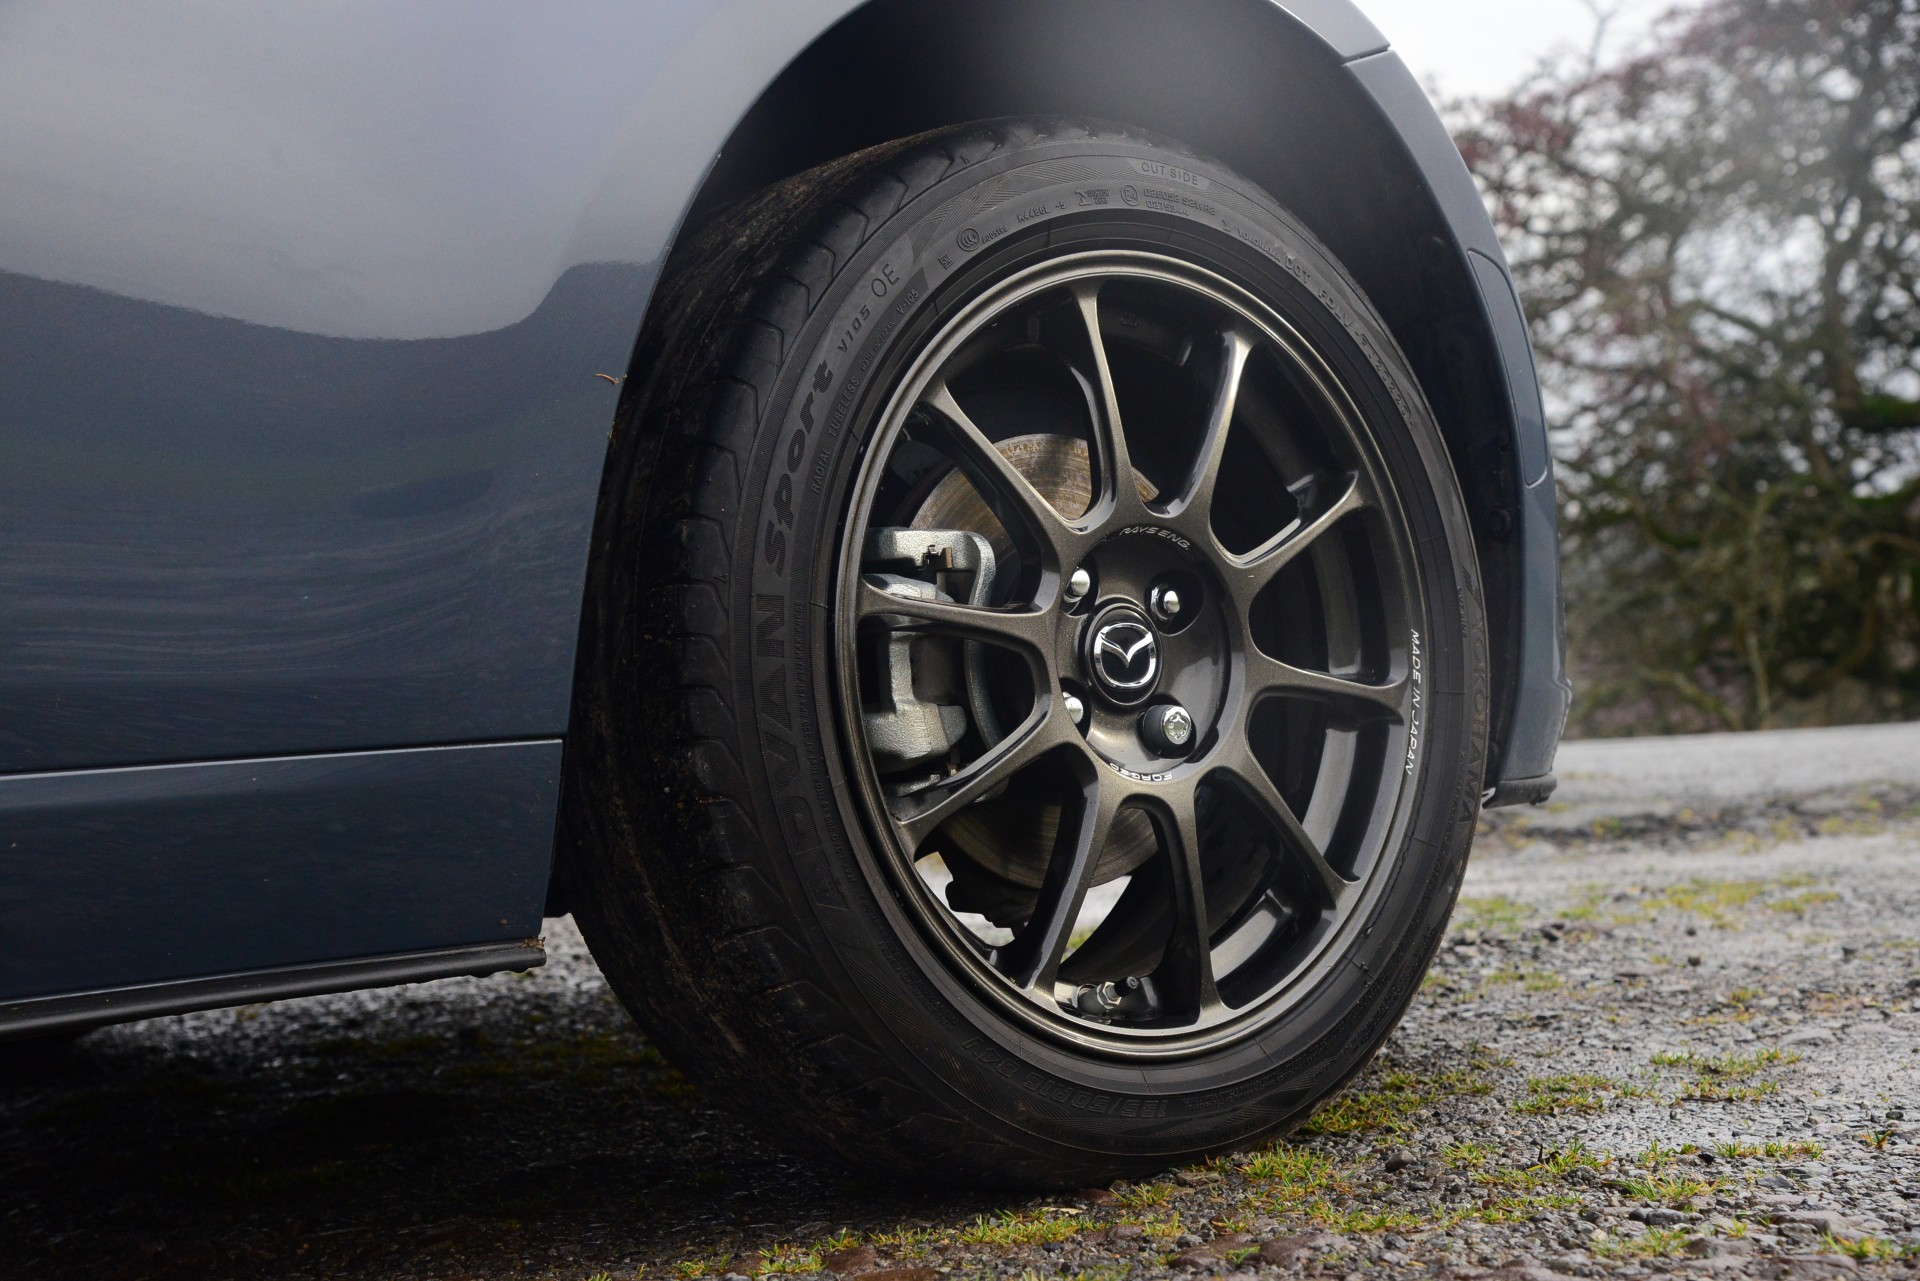 Mazda MX-5 R-Sport wheel tire detail